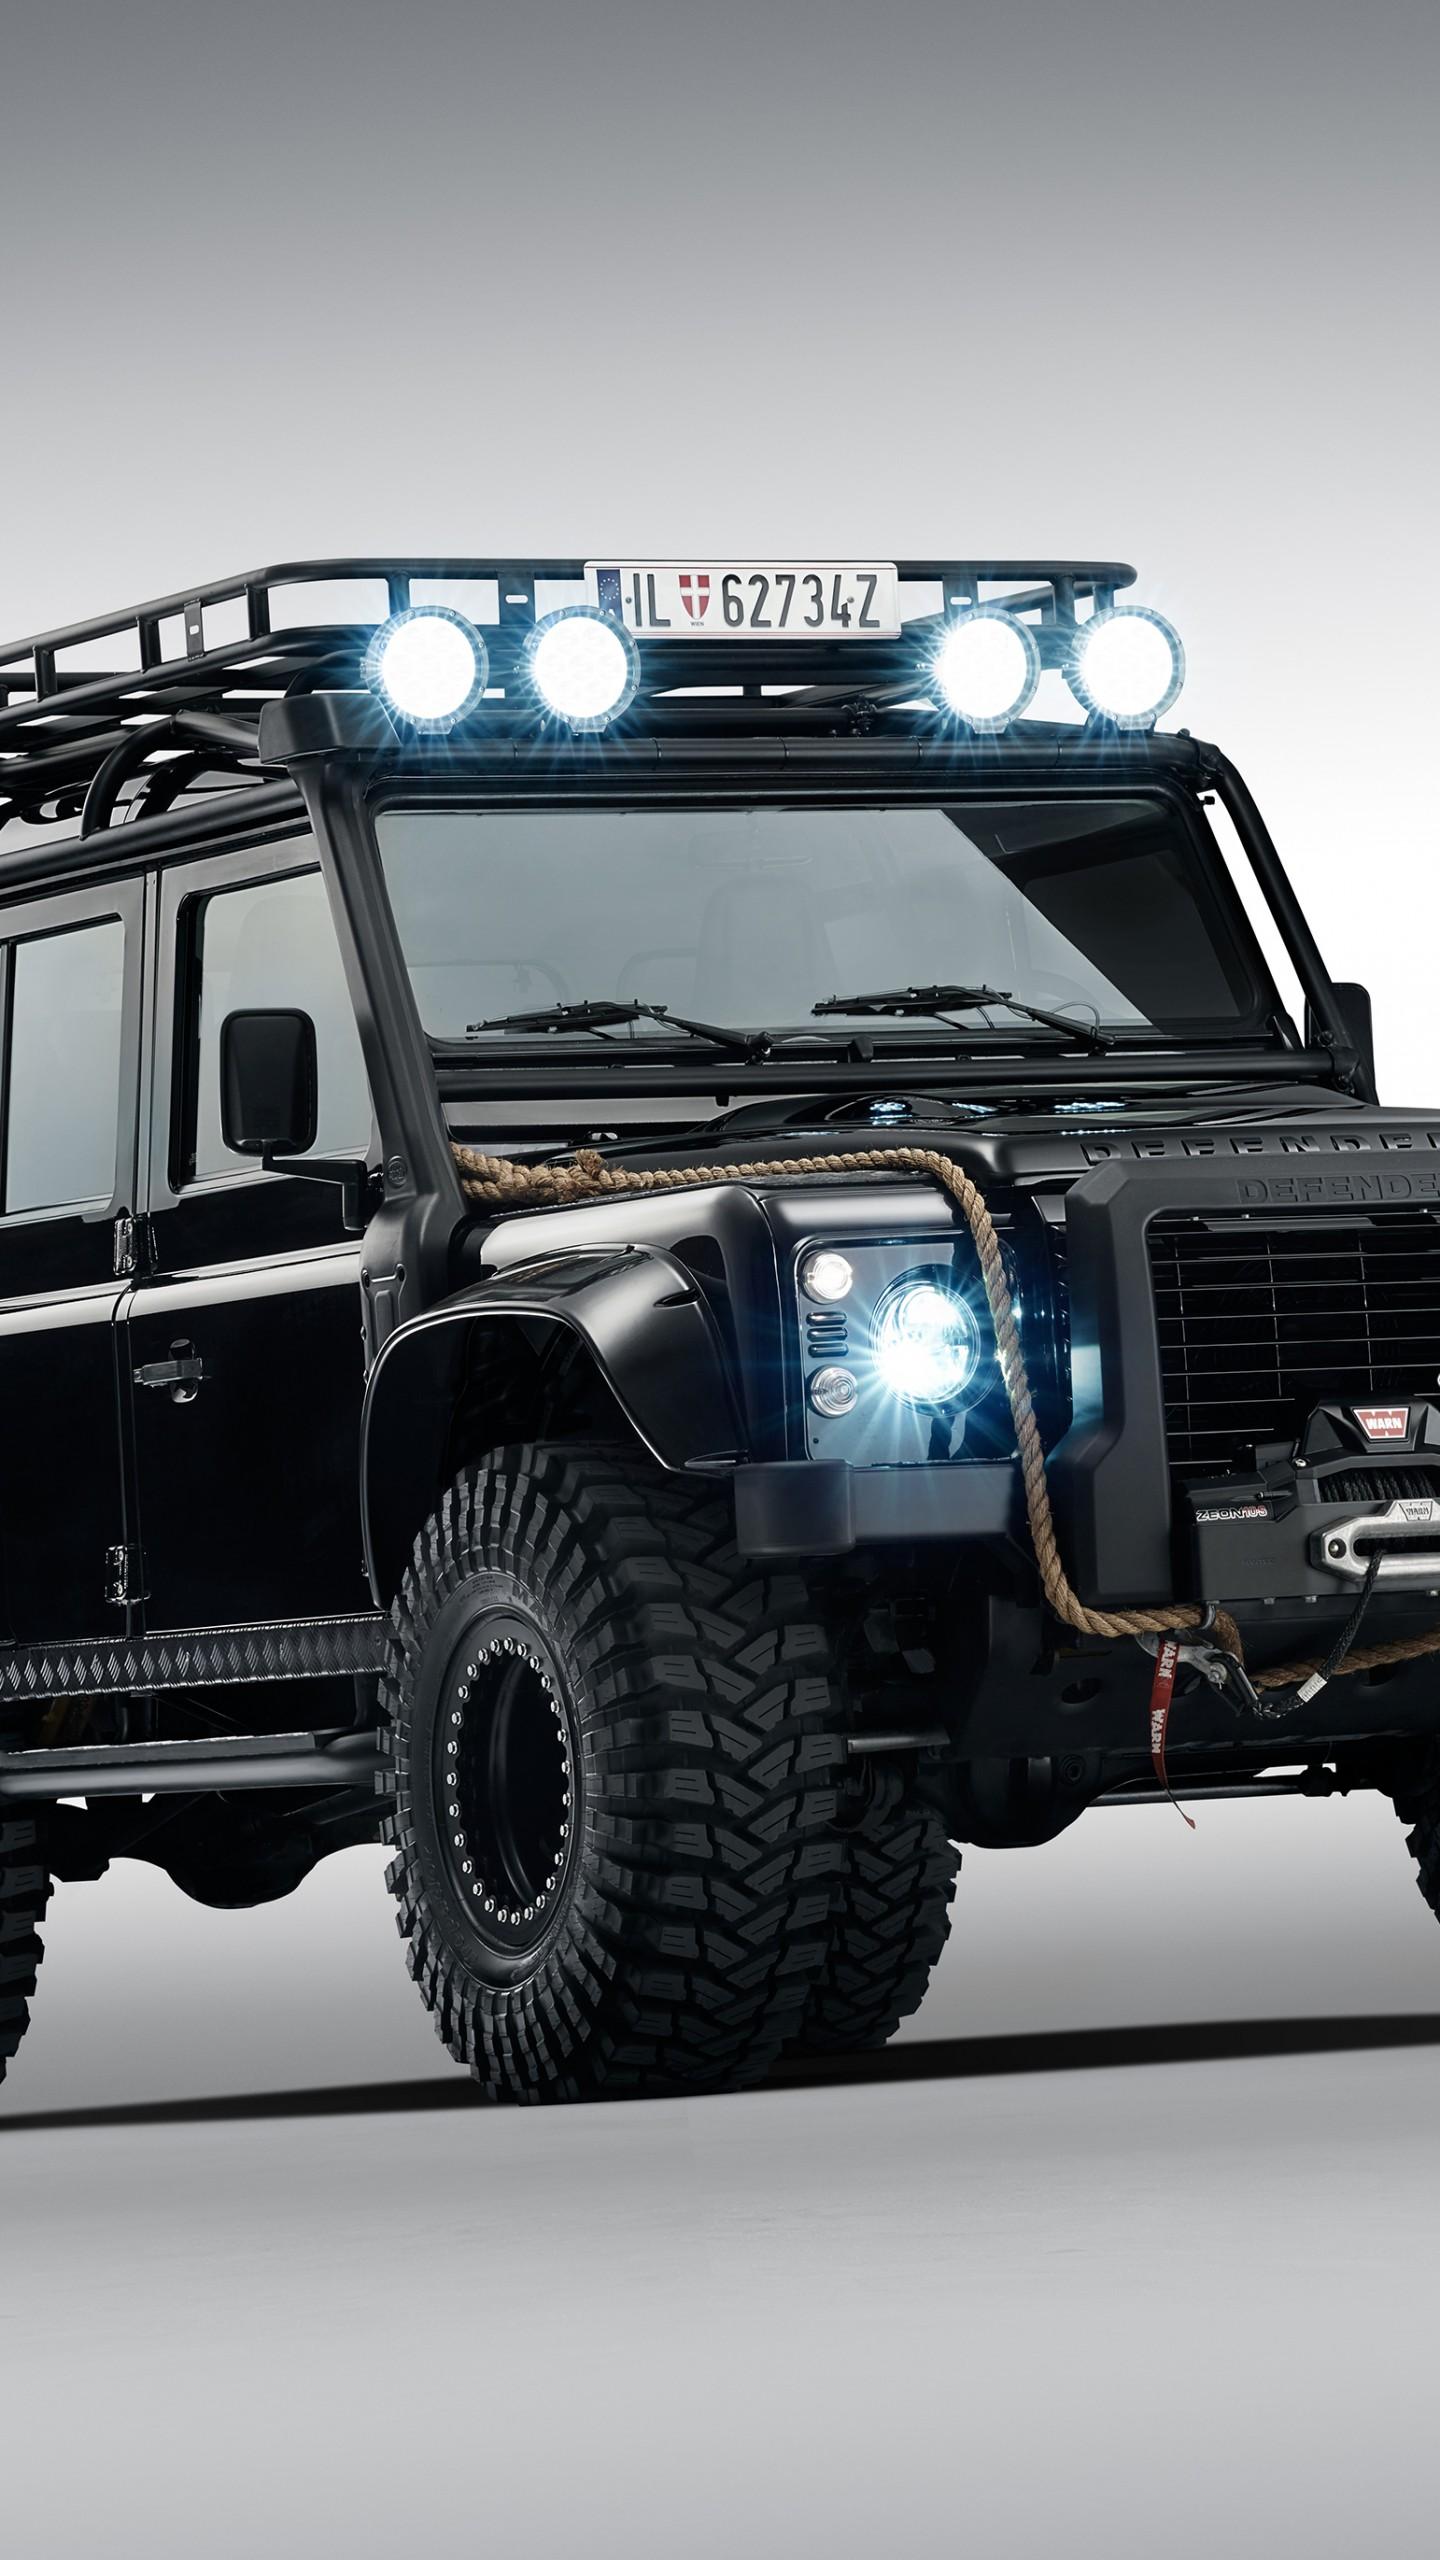 Wallpaper Land Rover Defender 110, 007 Spectre movie, Cars ...